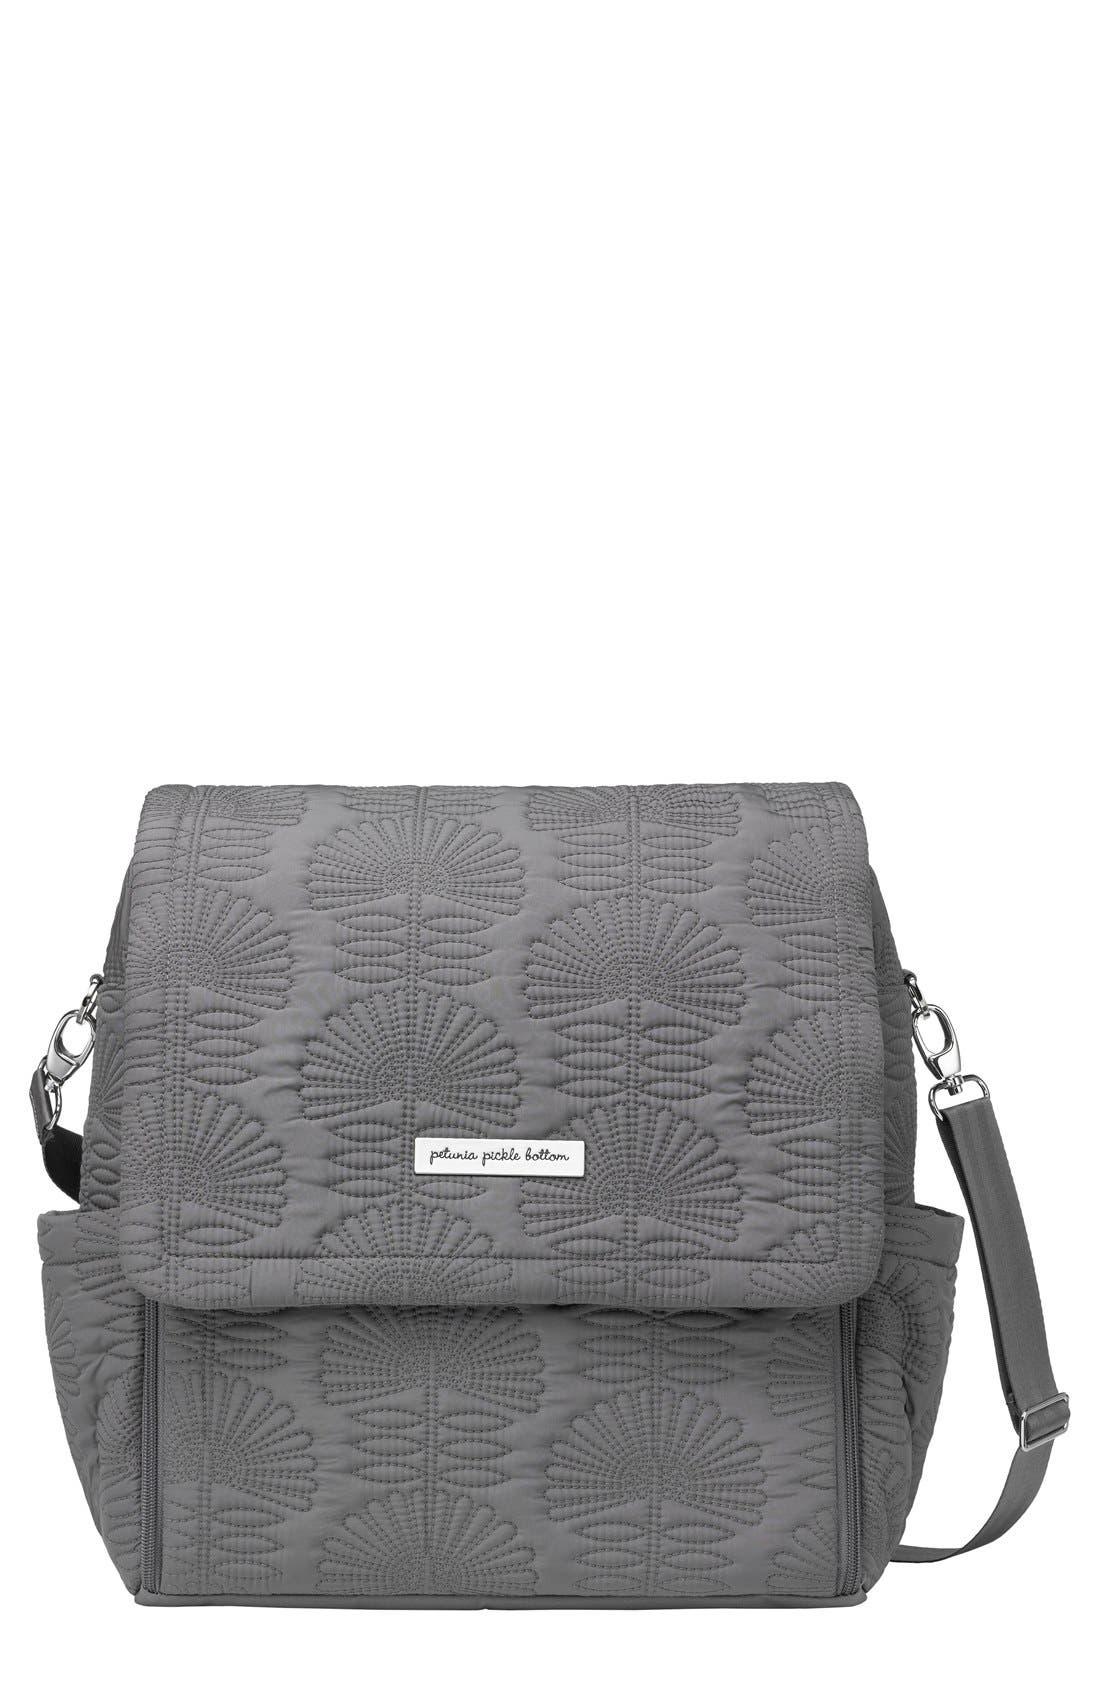 Petunia Pickle Bottom 'Embossed Boxy' Backpack Diaper Bag